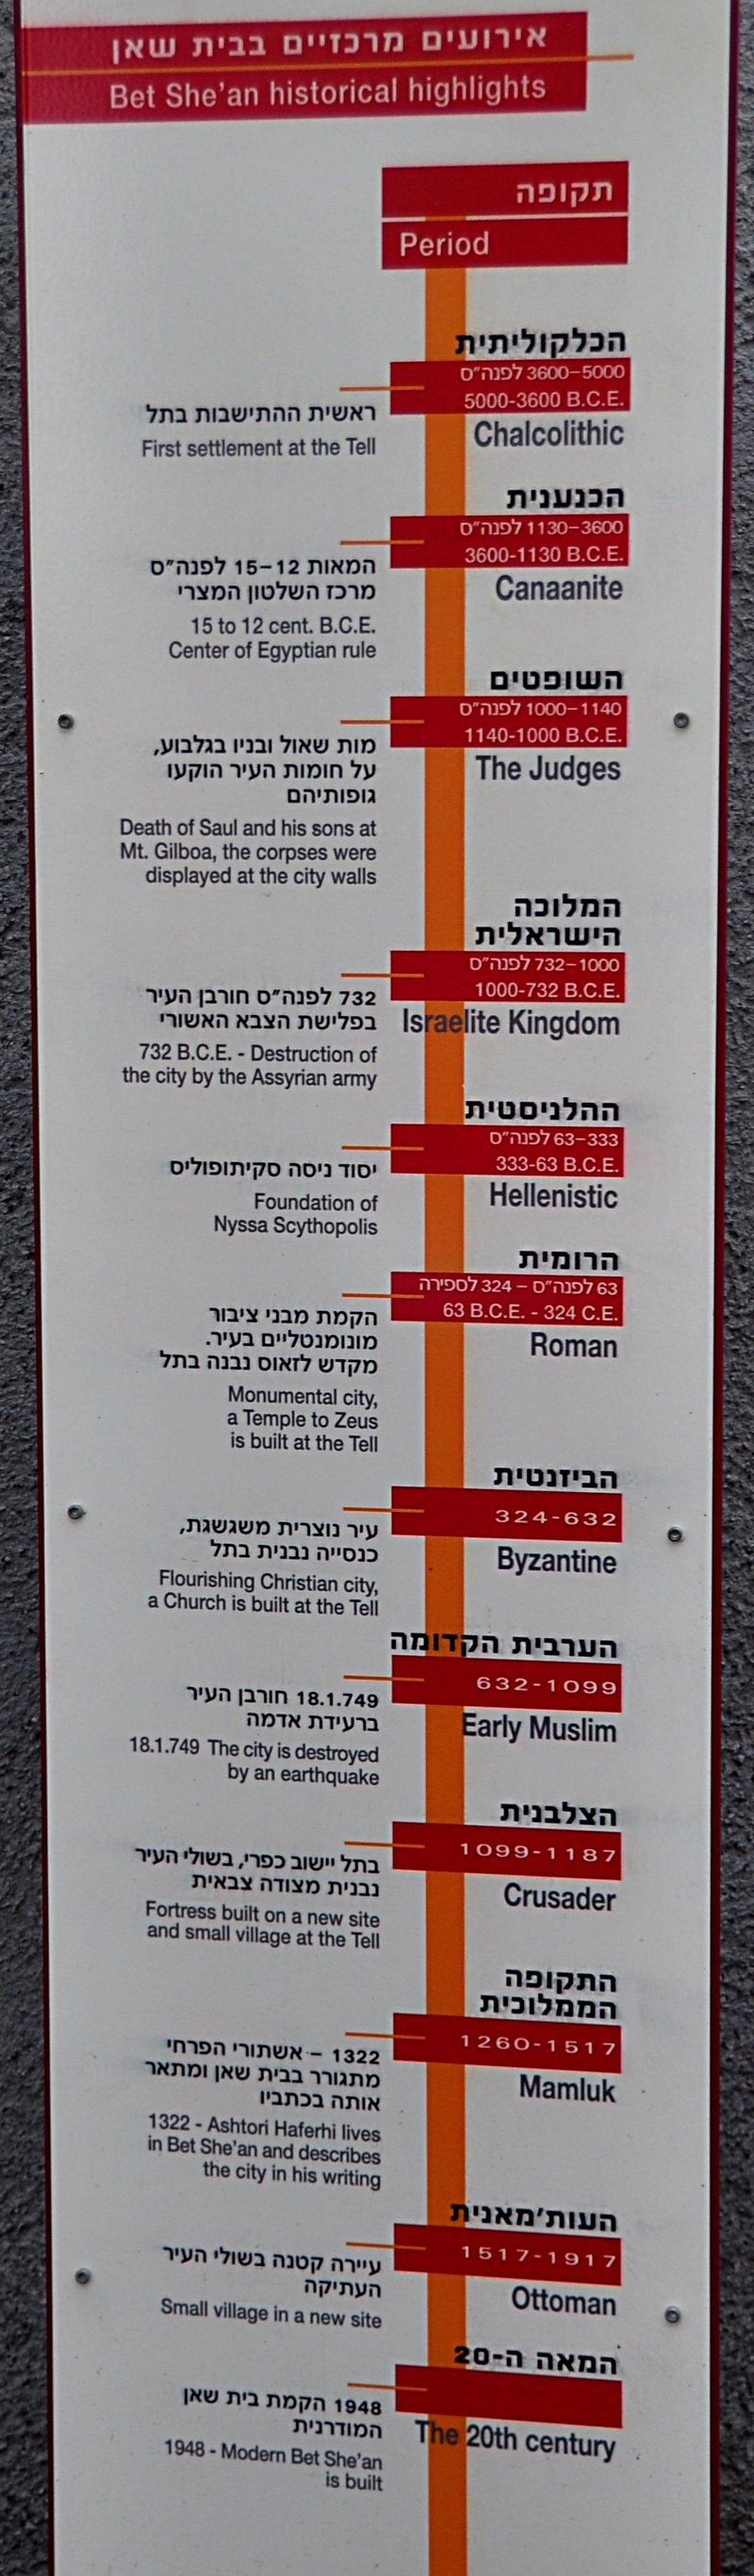 nov 19 1938 timeline